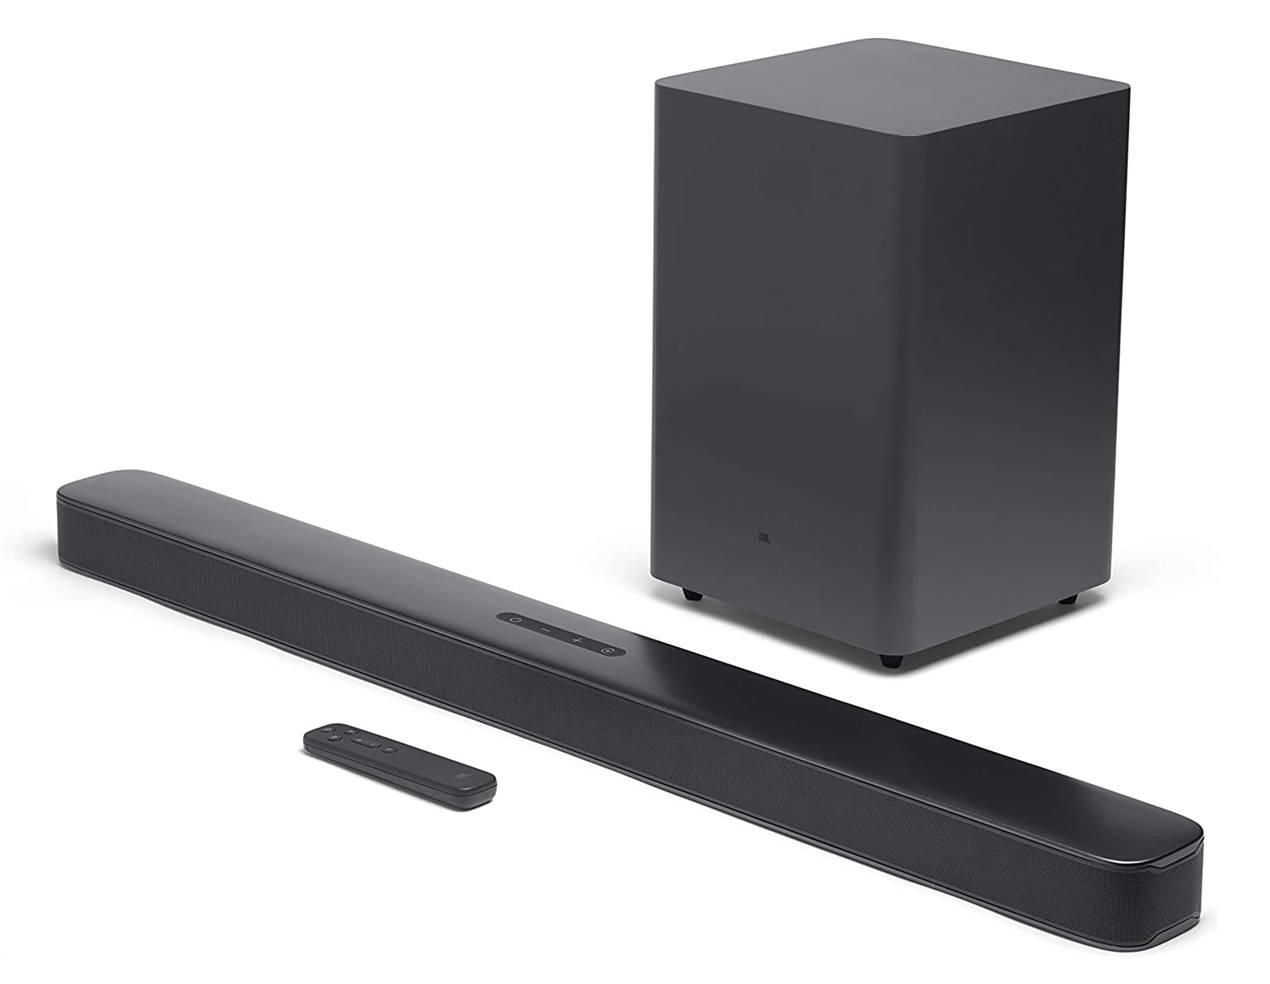 JBL Bar 2.1 Surround Sound System